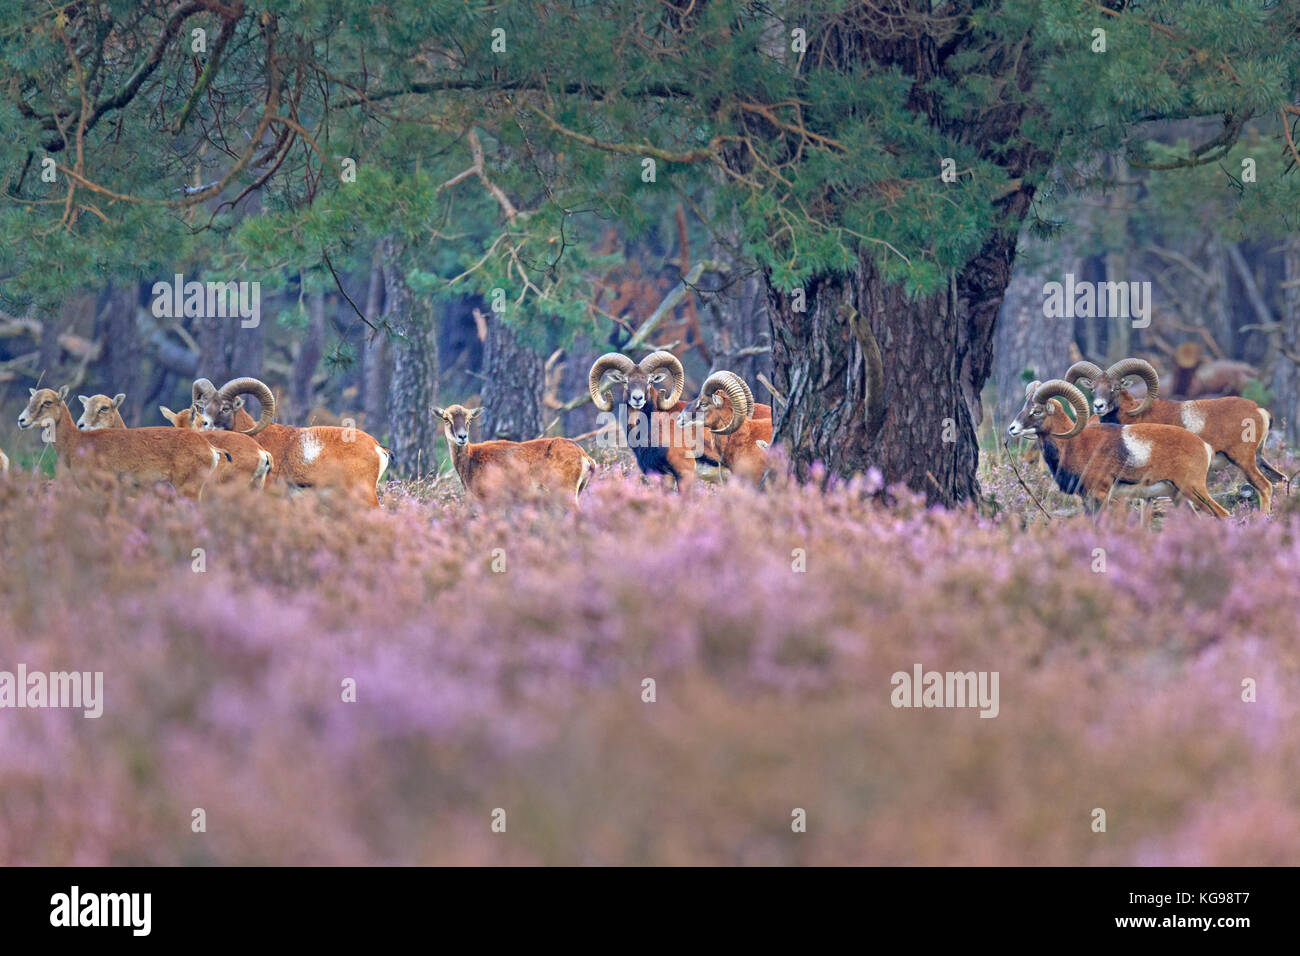 European Mouflon (Ovis orientalis musimon) Nationalpark Hoge Veluwe, Gelderland, Netherland, Europe - Stock Image